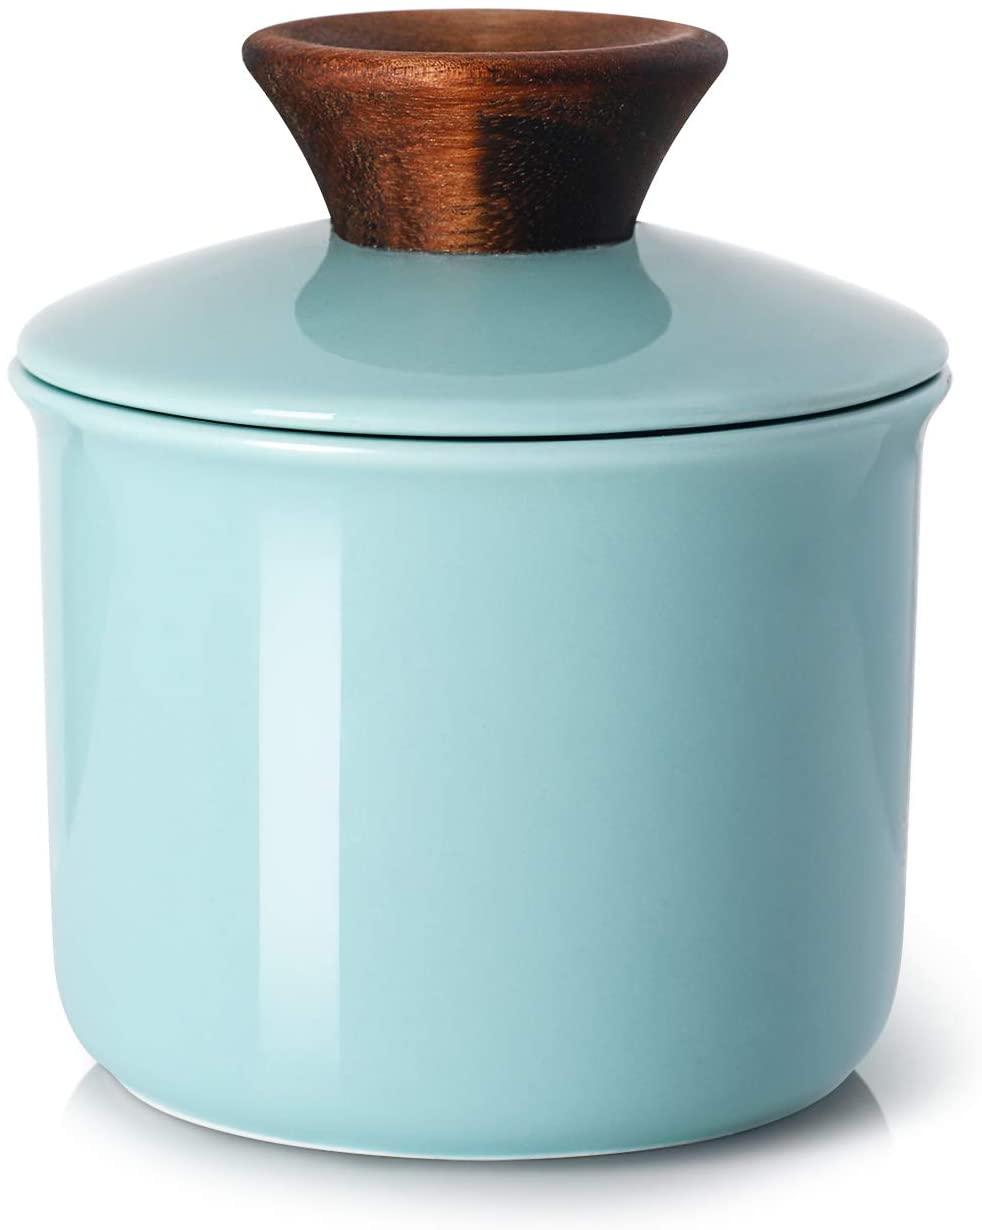 DOWAN Porcelain Butter Keeper Crock, French Butter Crock with Wood Knob Lid, Butter Dish for Soft Butter, Blue